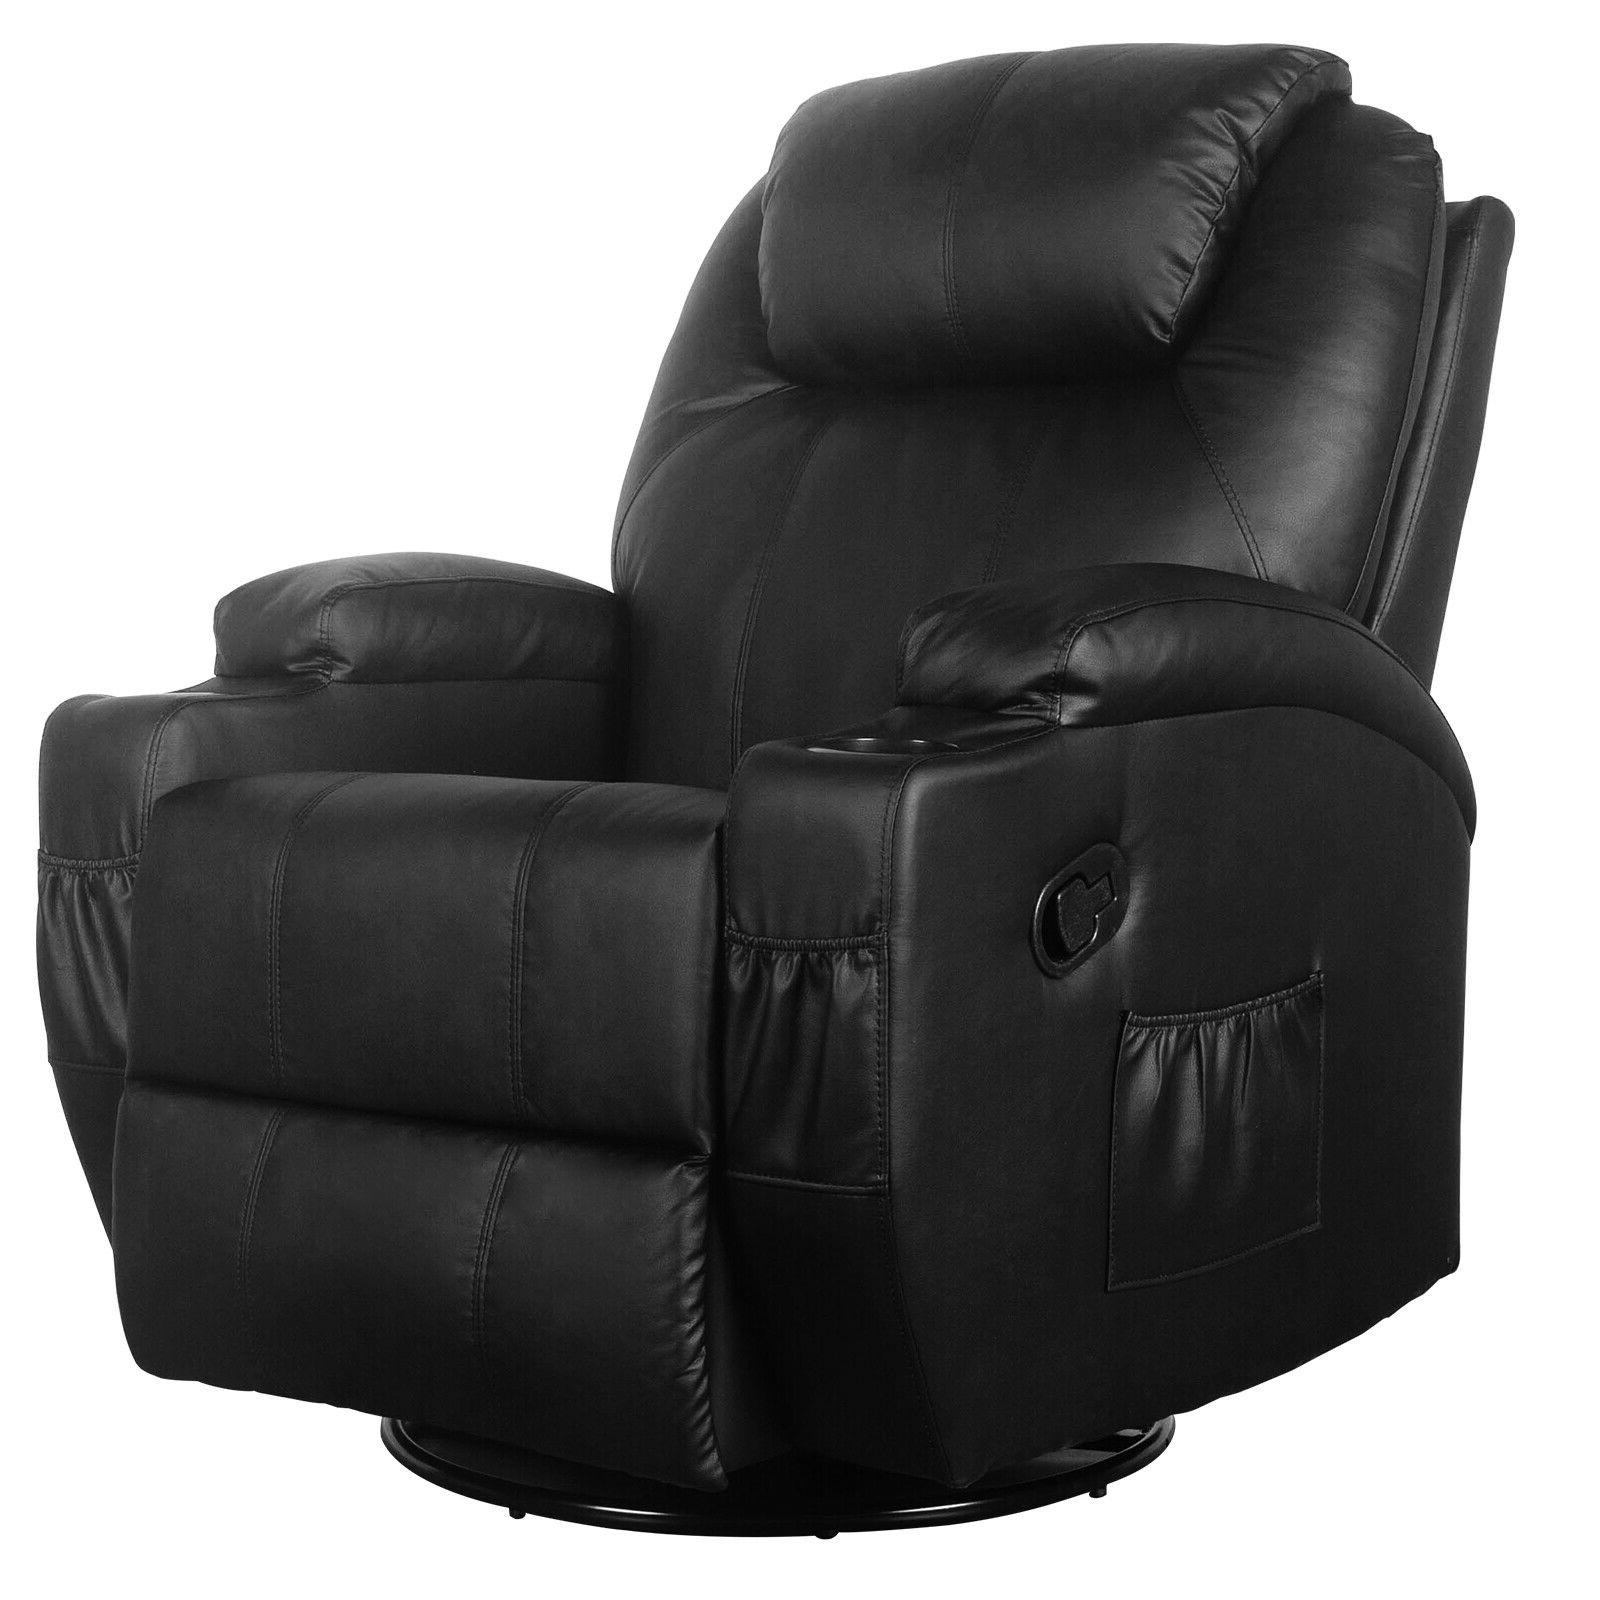 Massage Chair Heated Ergonomic Swivel